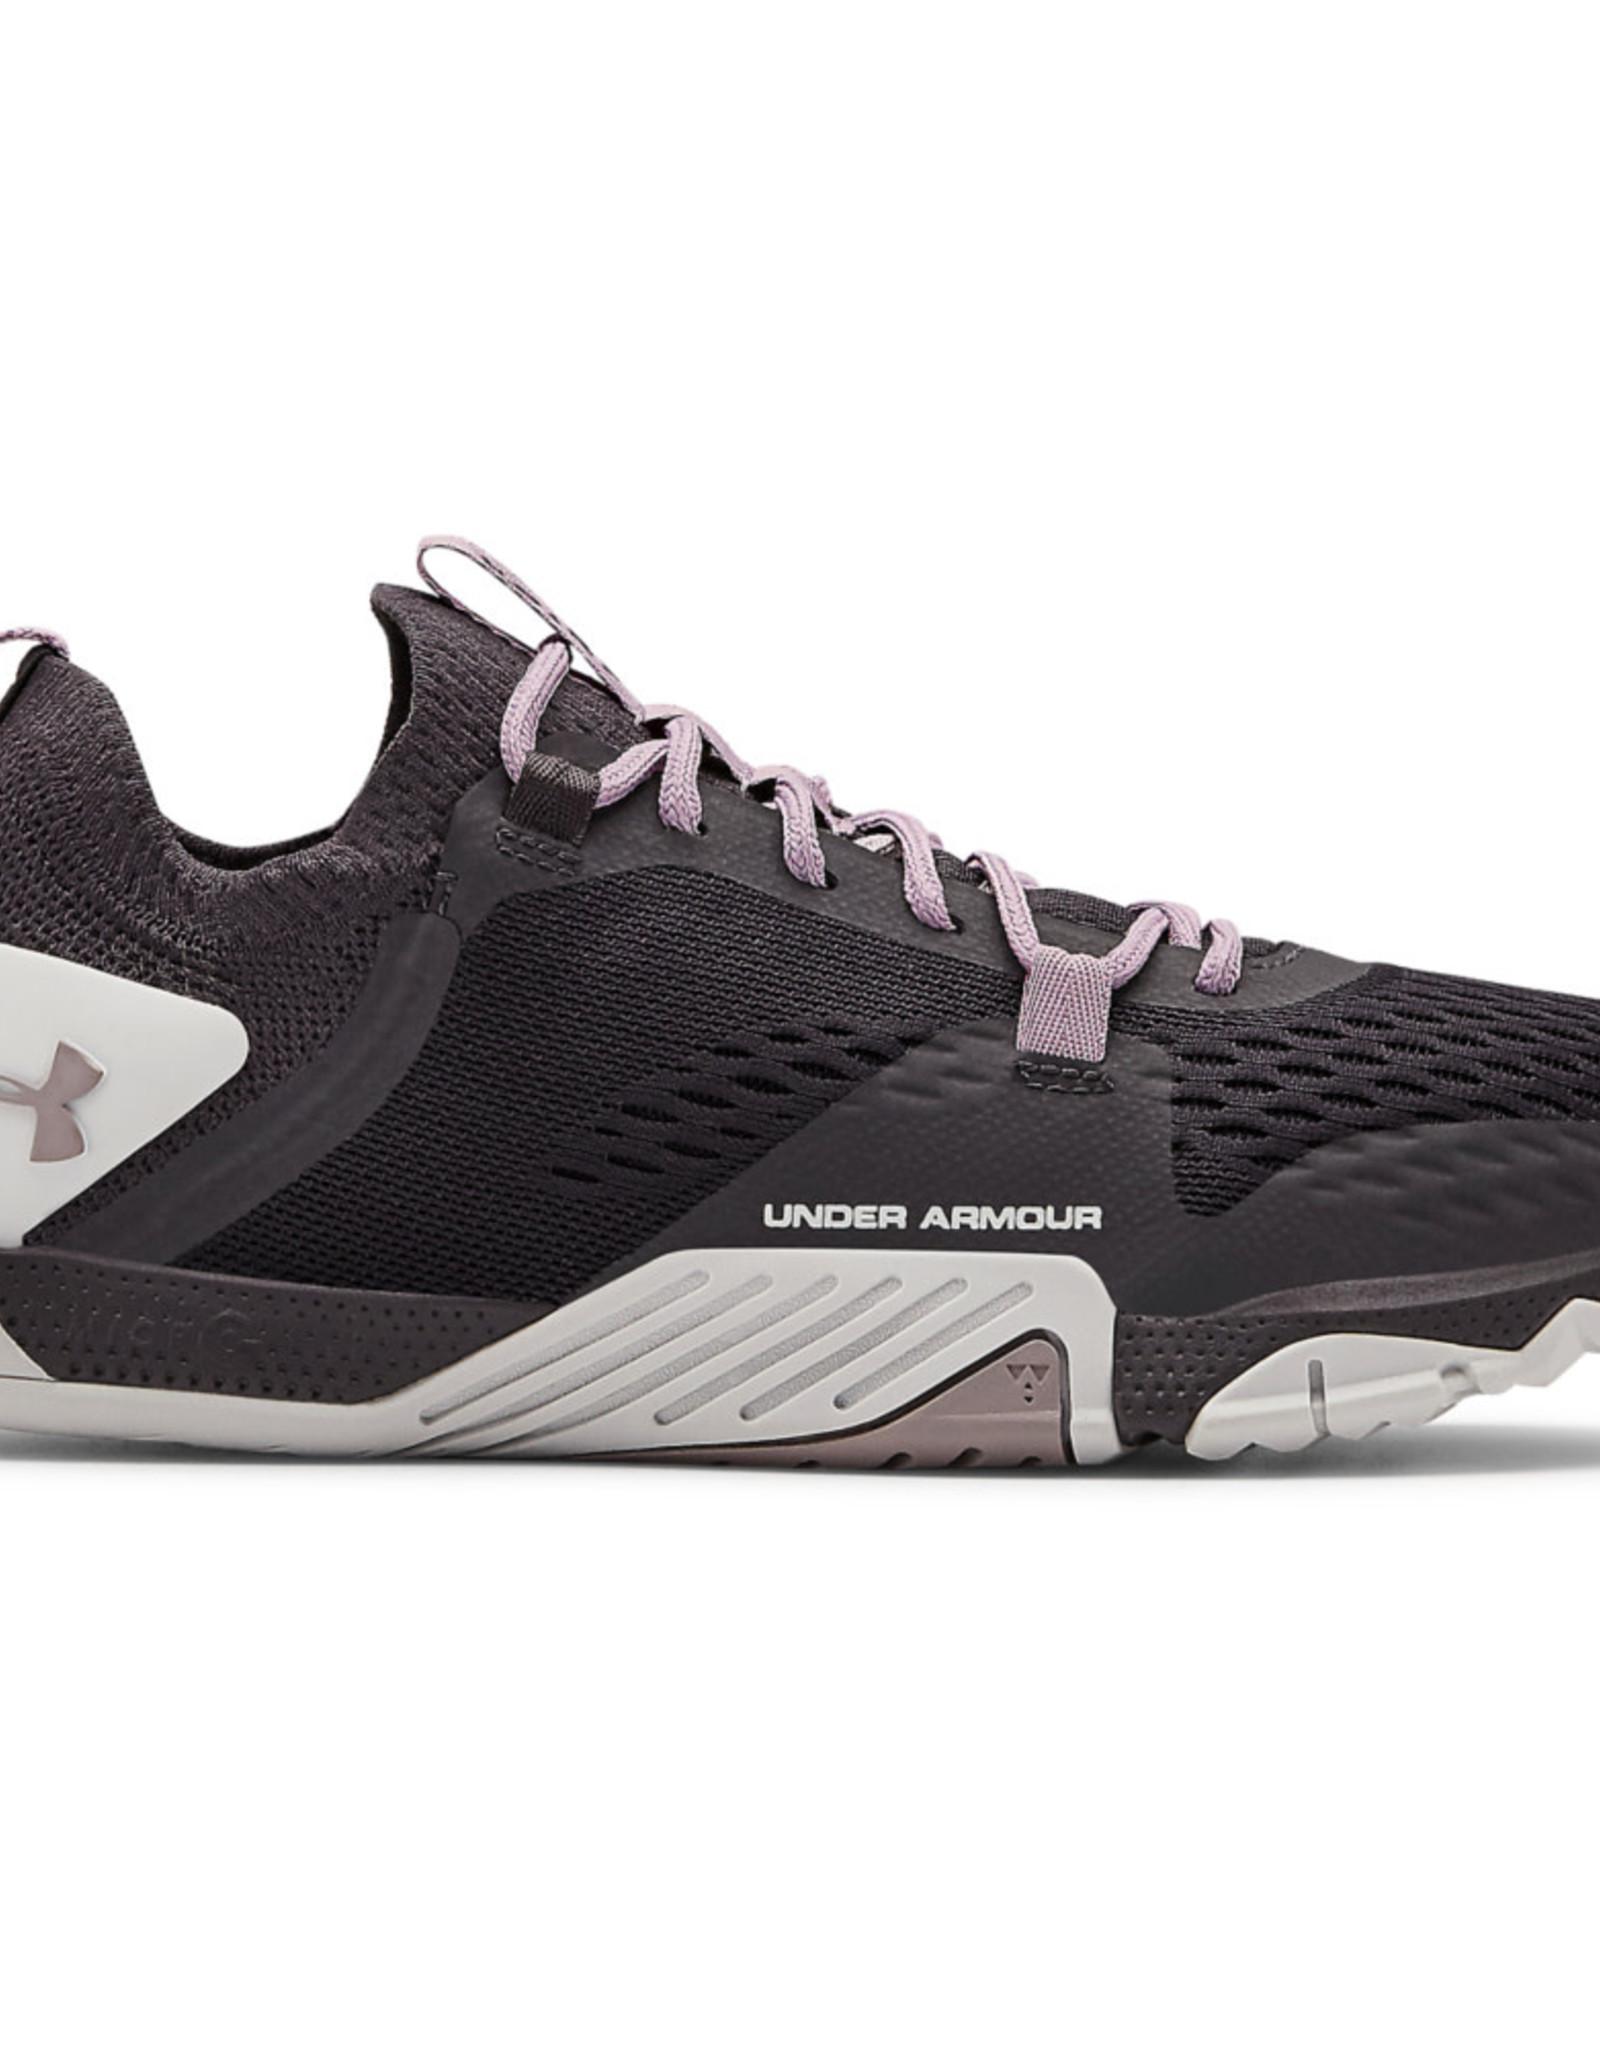 Under Armour UA W TriBase Reign 2 - Blackout Purple-Halo Gray-Slate Purple